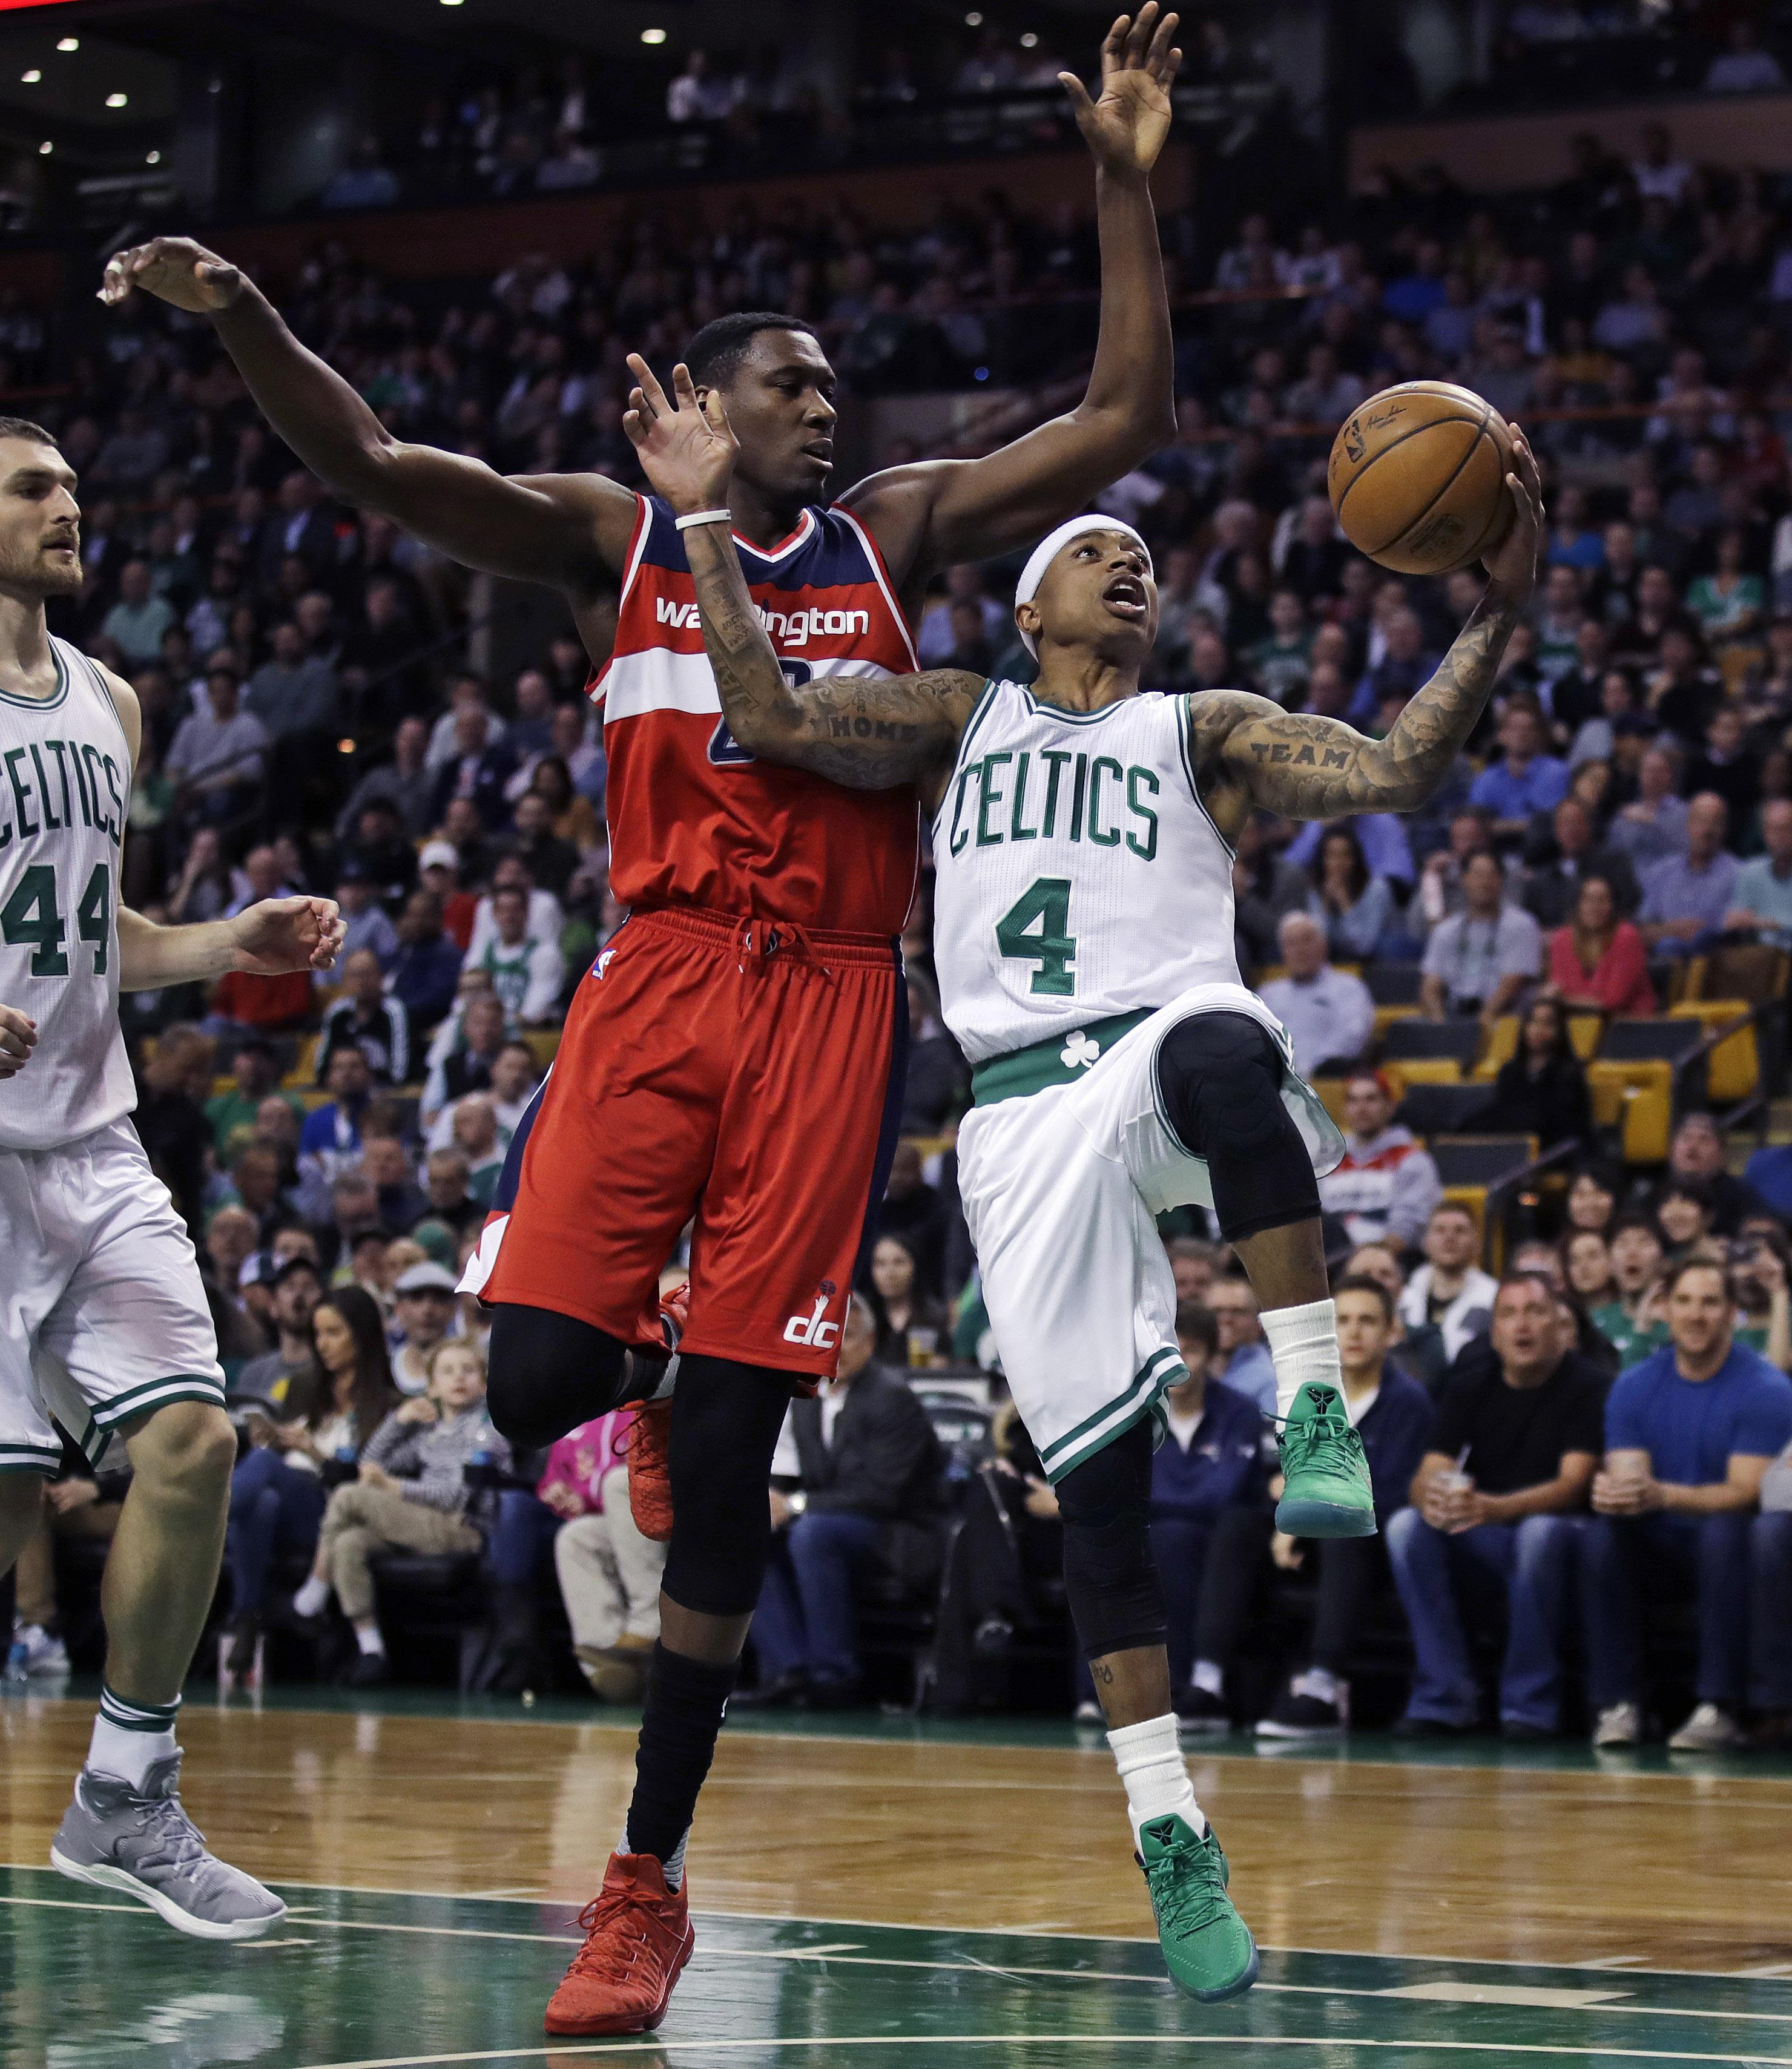 Wizards_celtics_basketball_09579